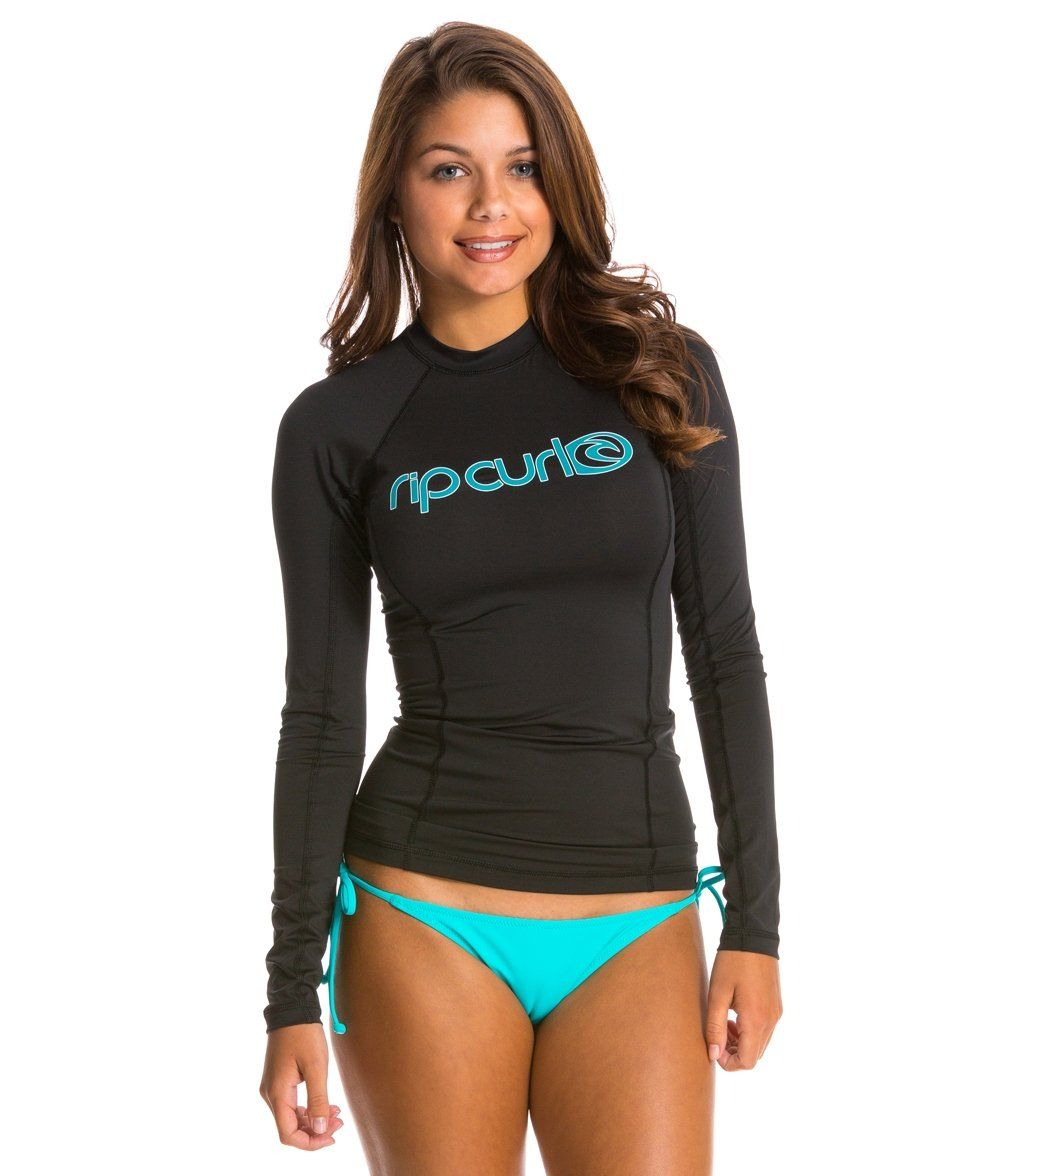 56abd276355b Rip Curl Women's Surf Team Long Sleeve Rashguard at SwimOutlet.com ...